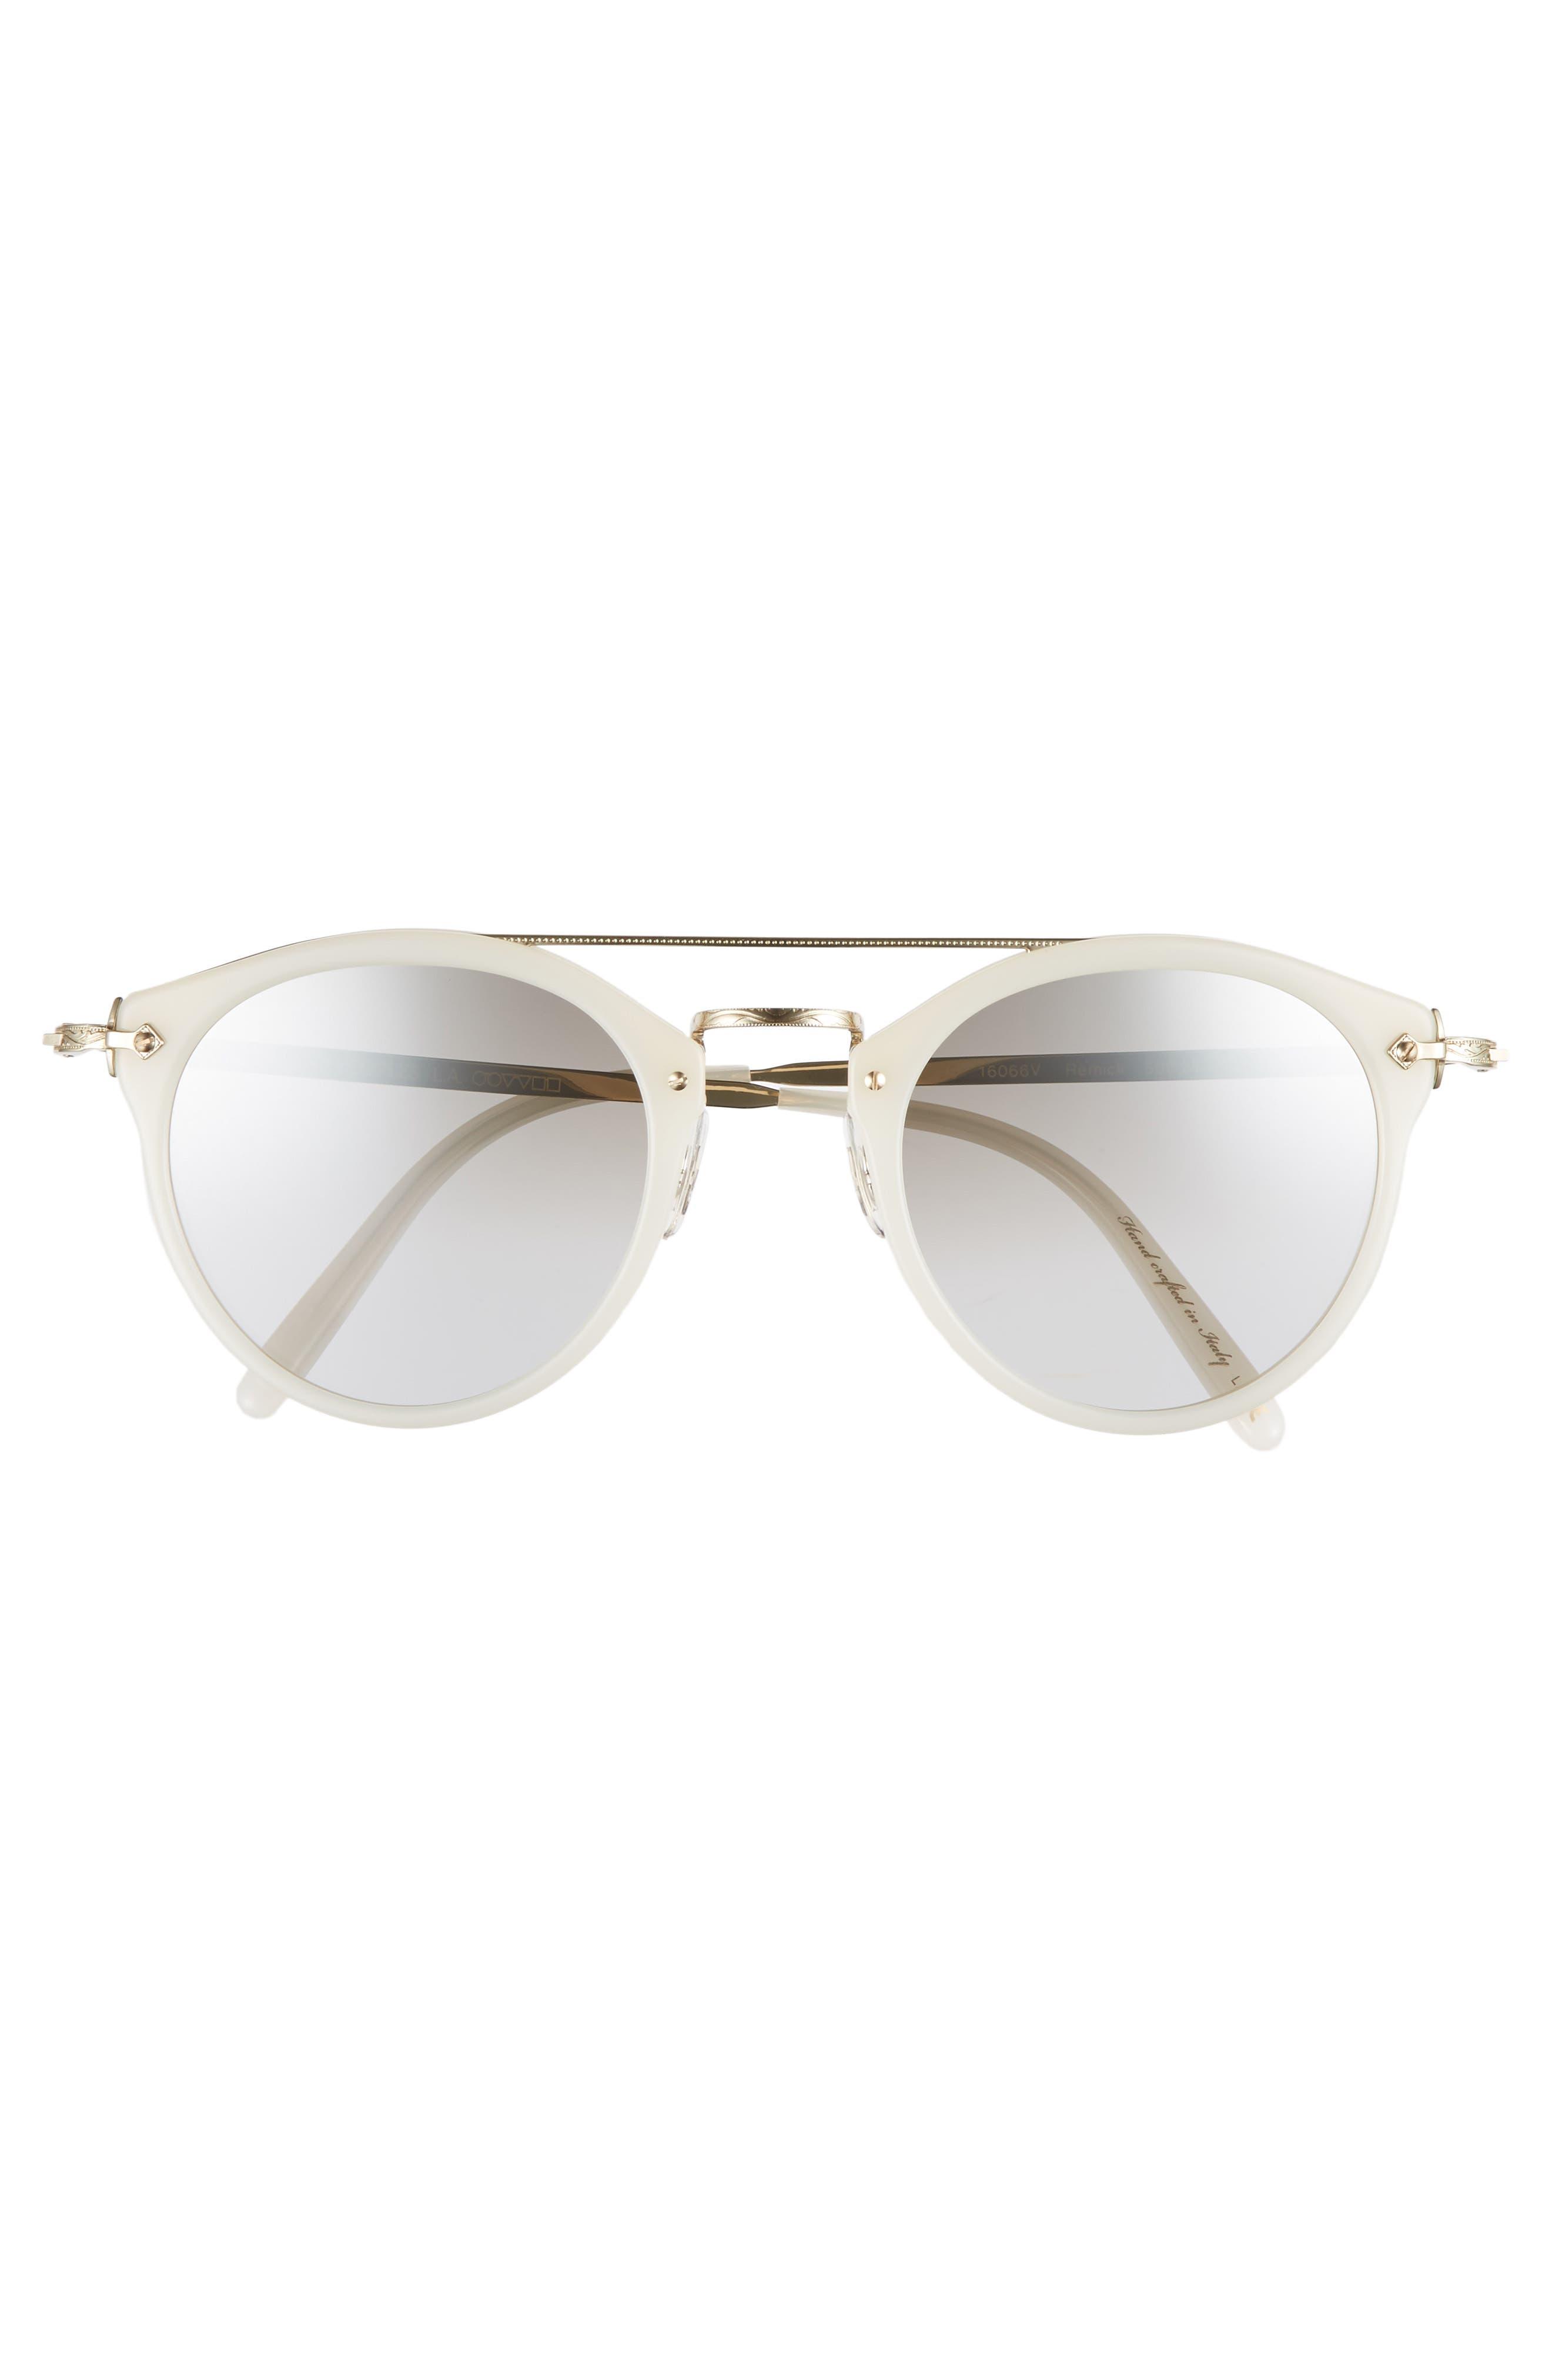 Remick 50mm Brow Bar Sunglasses,                             Alternate thumbnail 3, color,                             100